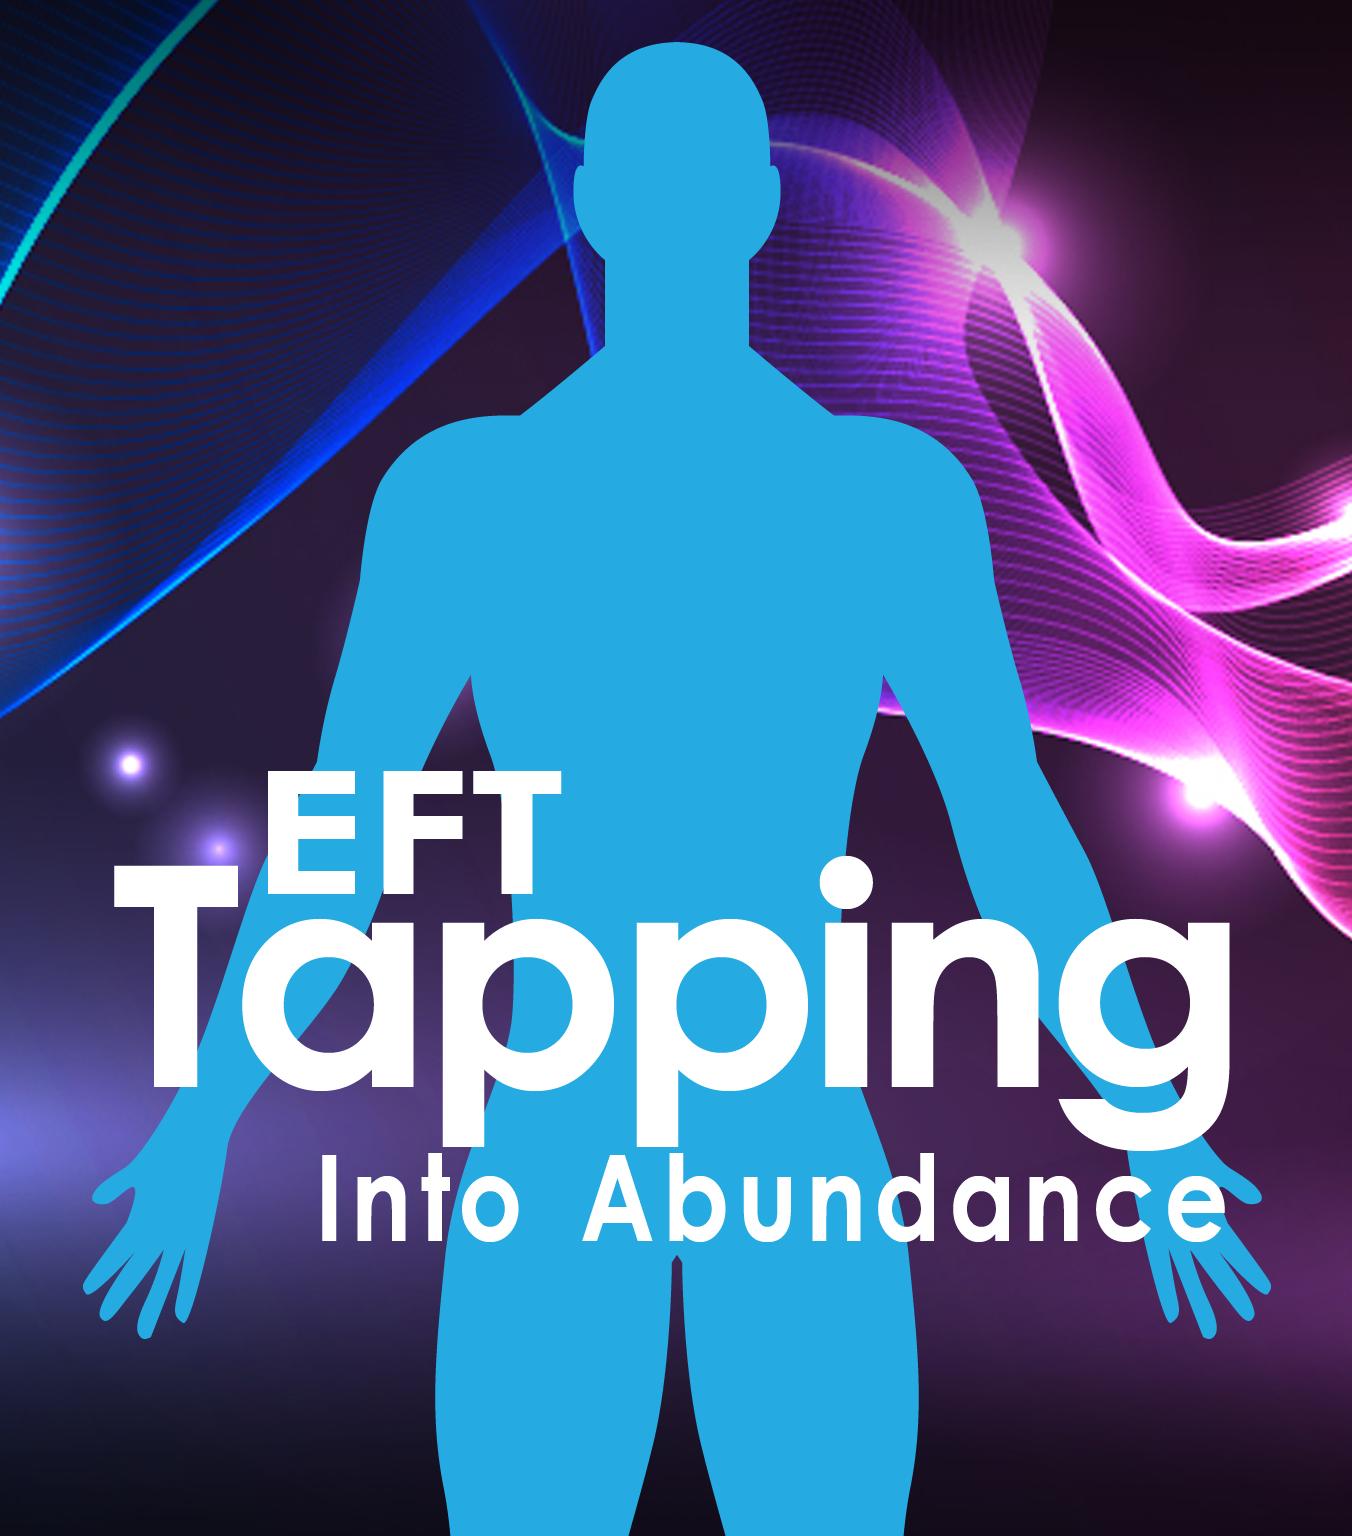 EFT Tapping Abundance